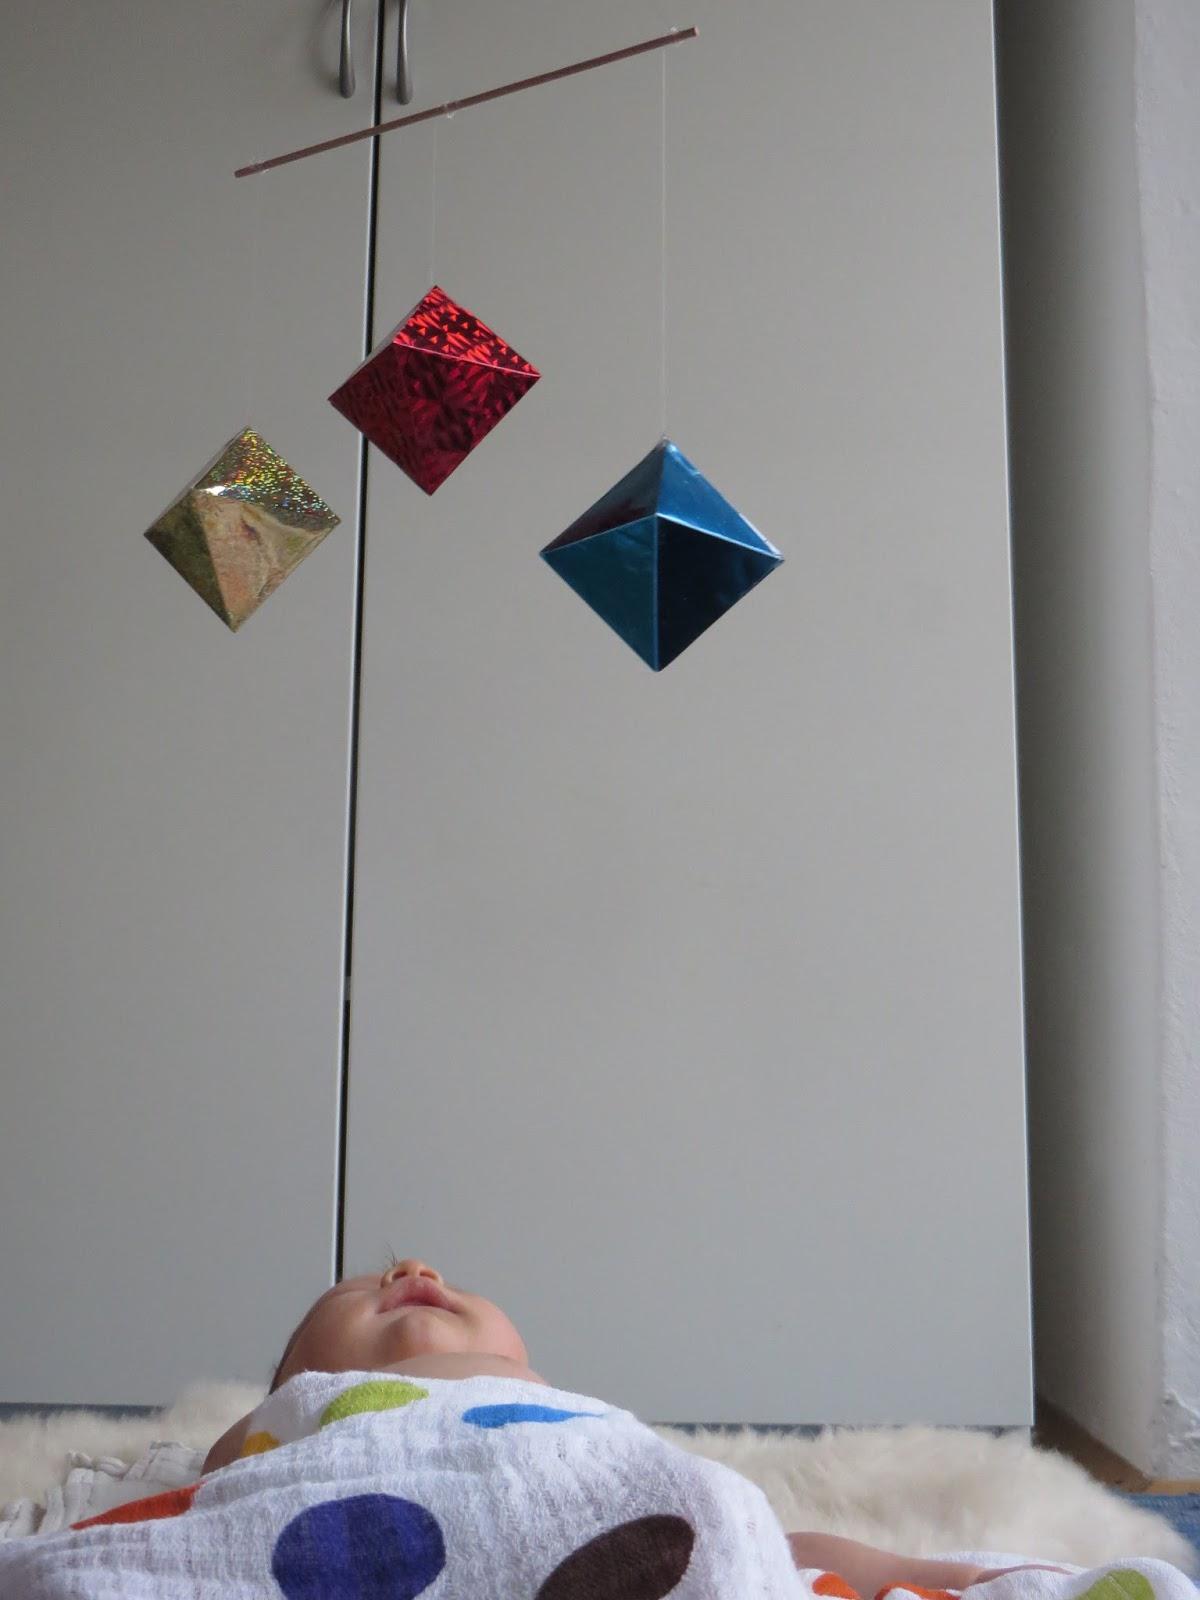 Oktaedri montessori mobili ogice in kravate for Mobili montessori